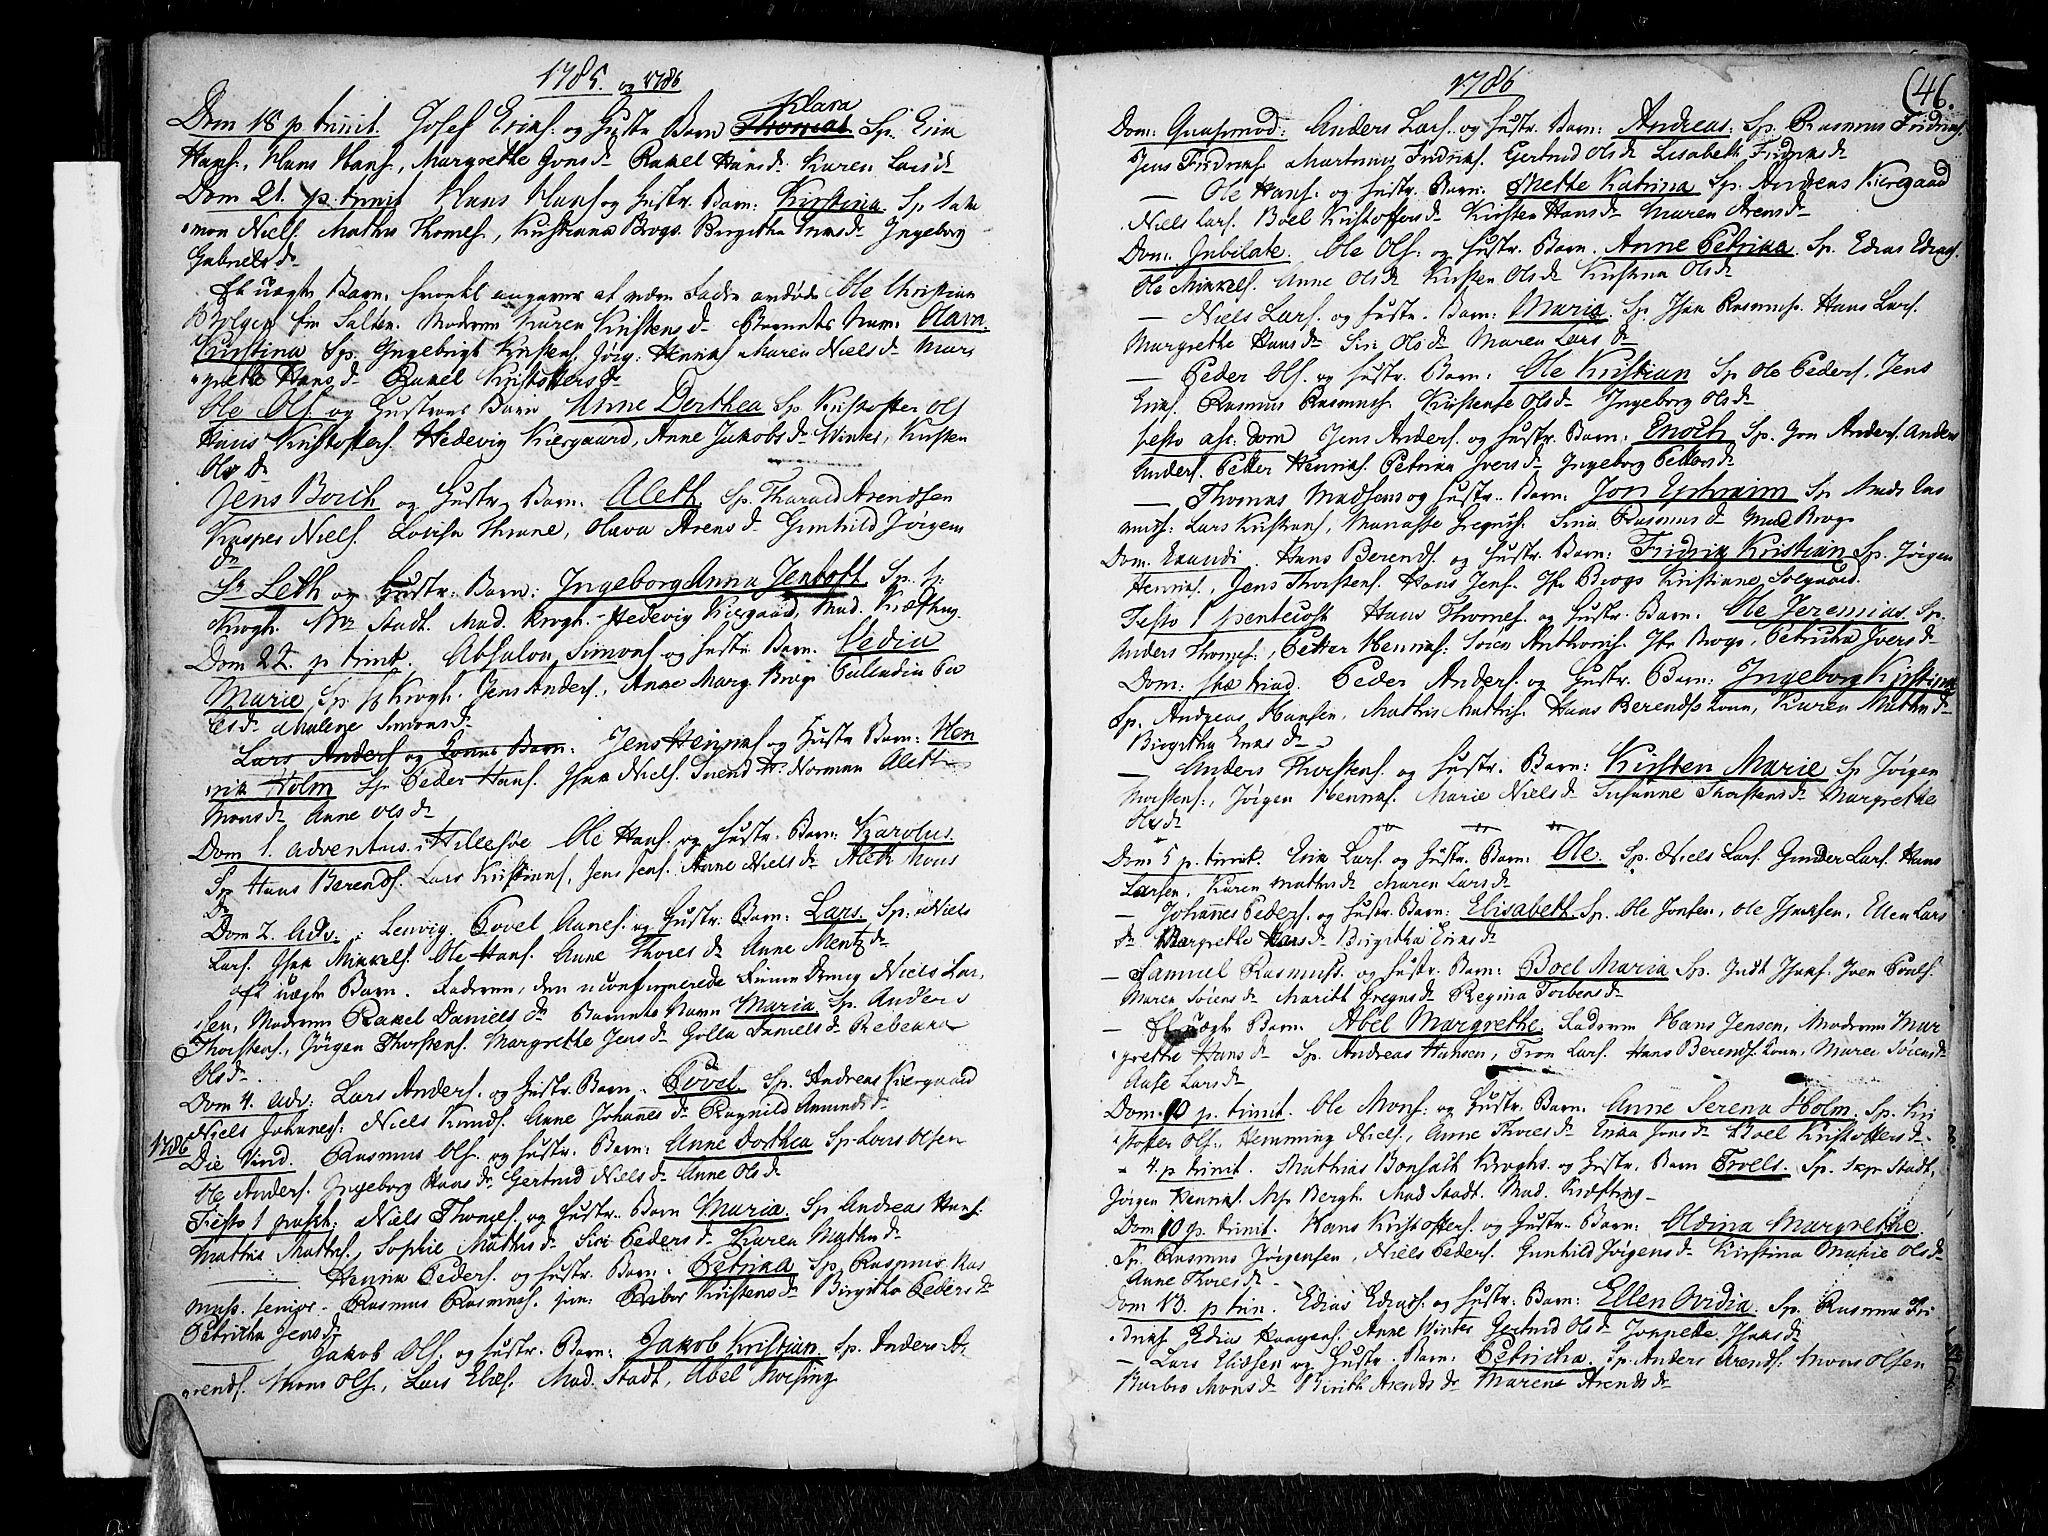 SATØ, Lenvik sokneprestembete, H/Ha/Haa/L0002kirke: Ministerialbok nr. 2, 1784-1820, s. 46